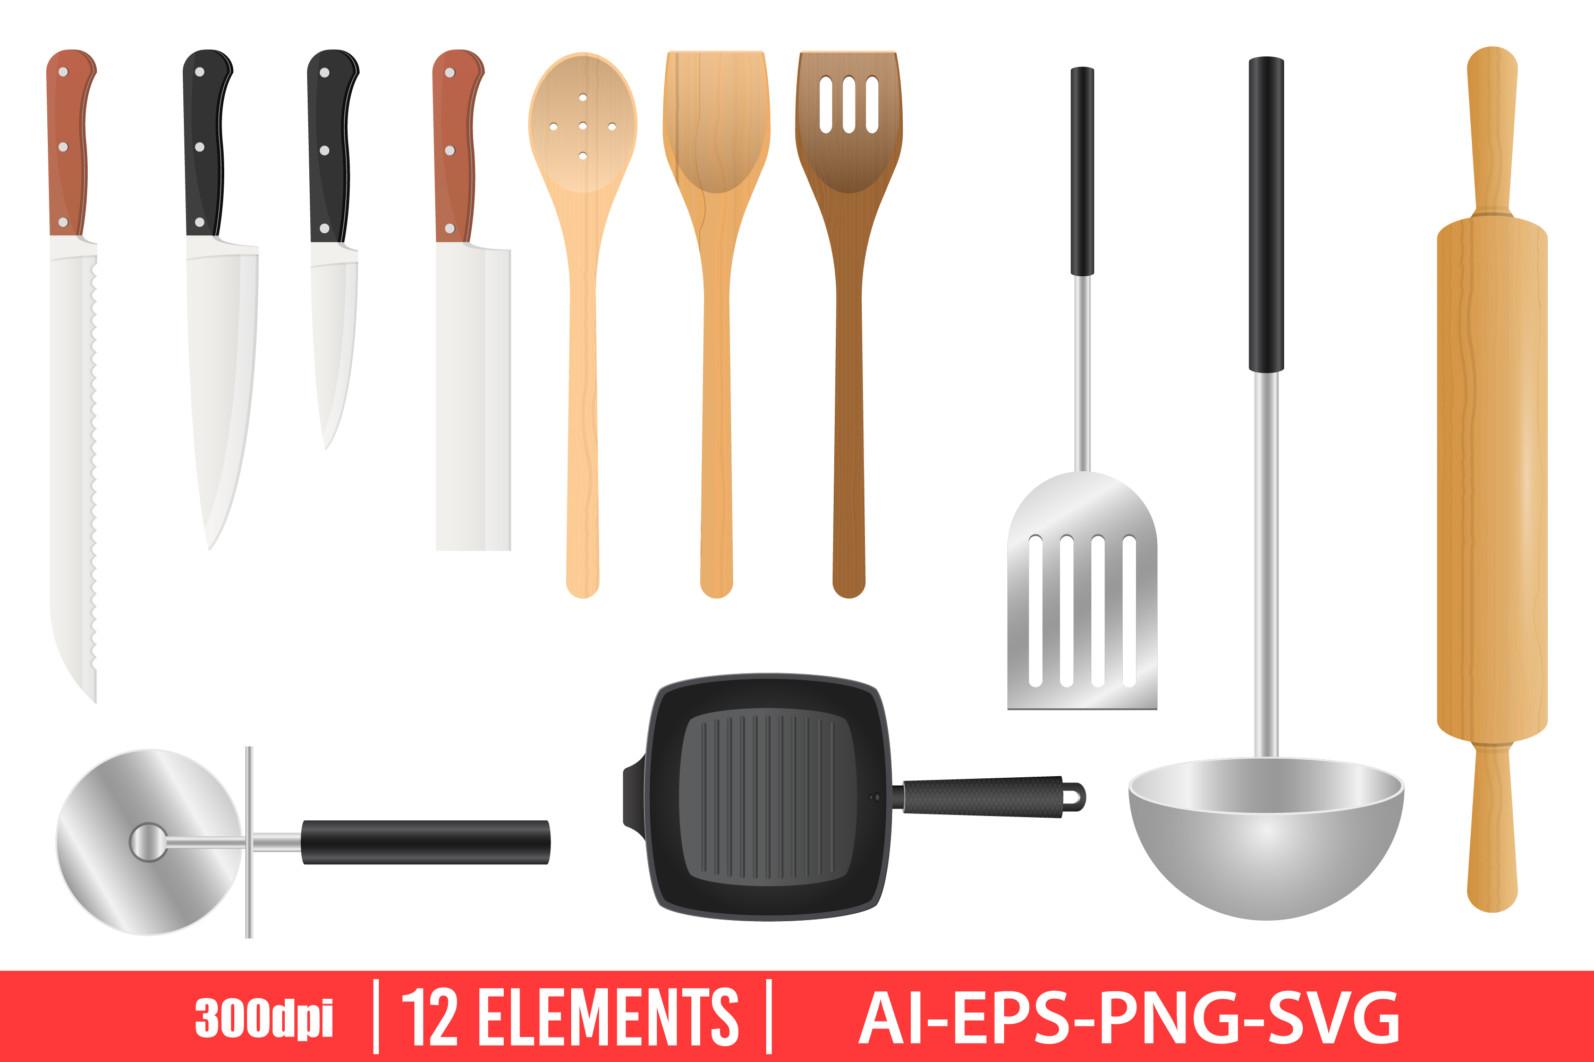 Kitchenware clipart vector design illustration. Kitchenware set. Vector Clipart Print - KITCHENWARE scaled -